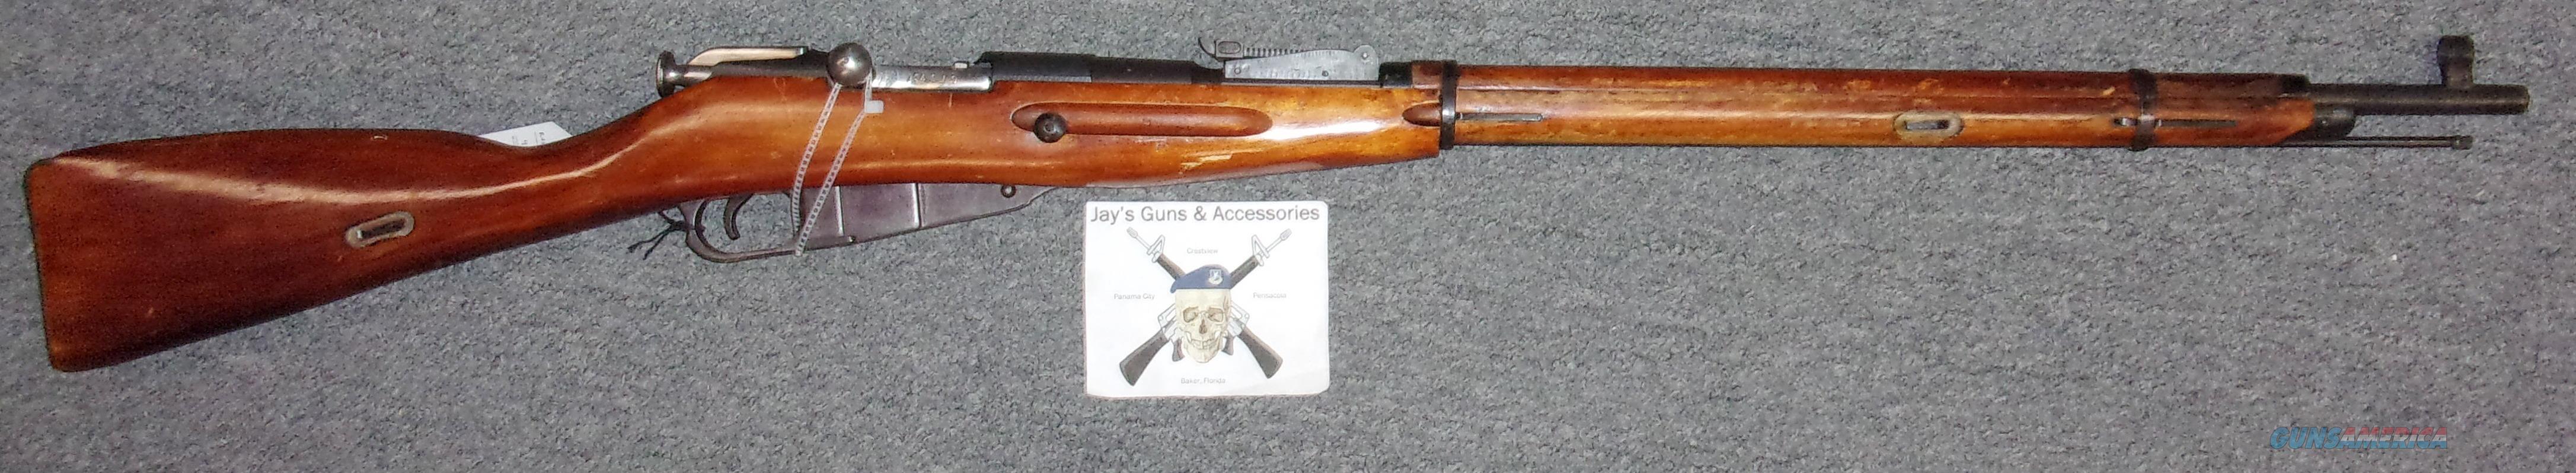 Russian/Inter Ordnance 91/30  Guns > Rifles > Inter Ordnance Inc. Rifles